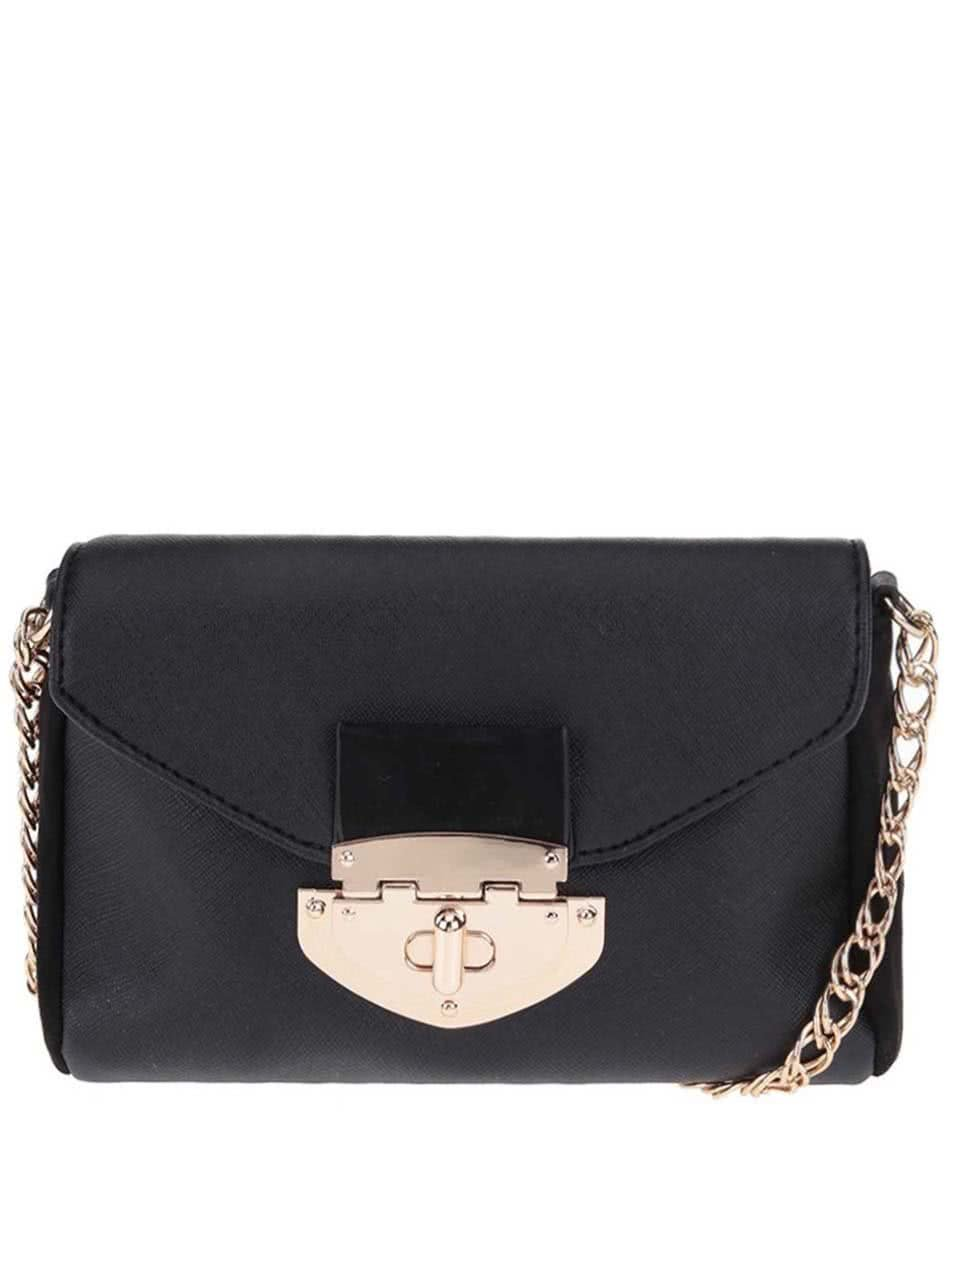 Čierna menšia crossbody kabelka Dorothy Perkins ... a0139298936